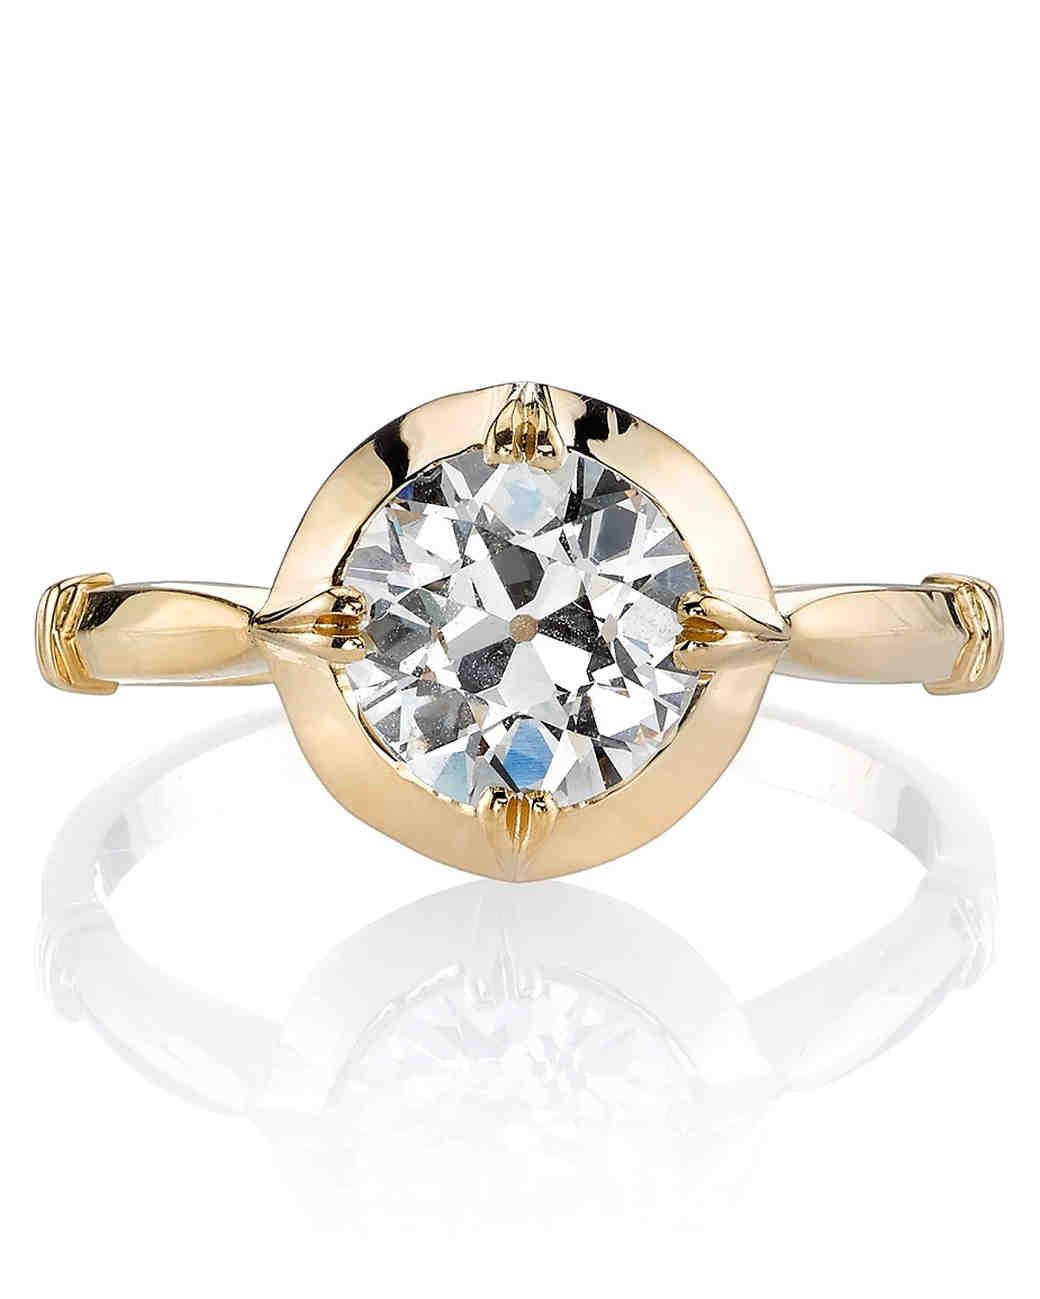 Single Stone Logan Euro-cut yellow gold engagement ring